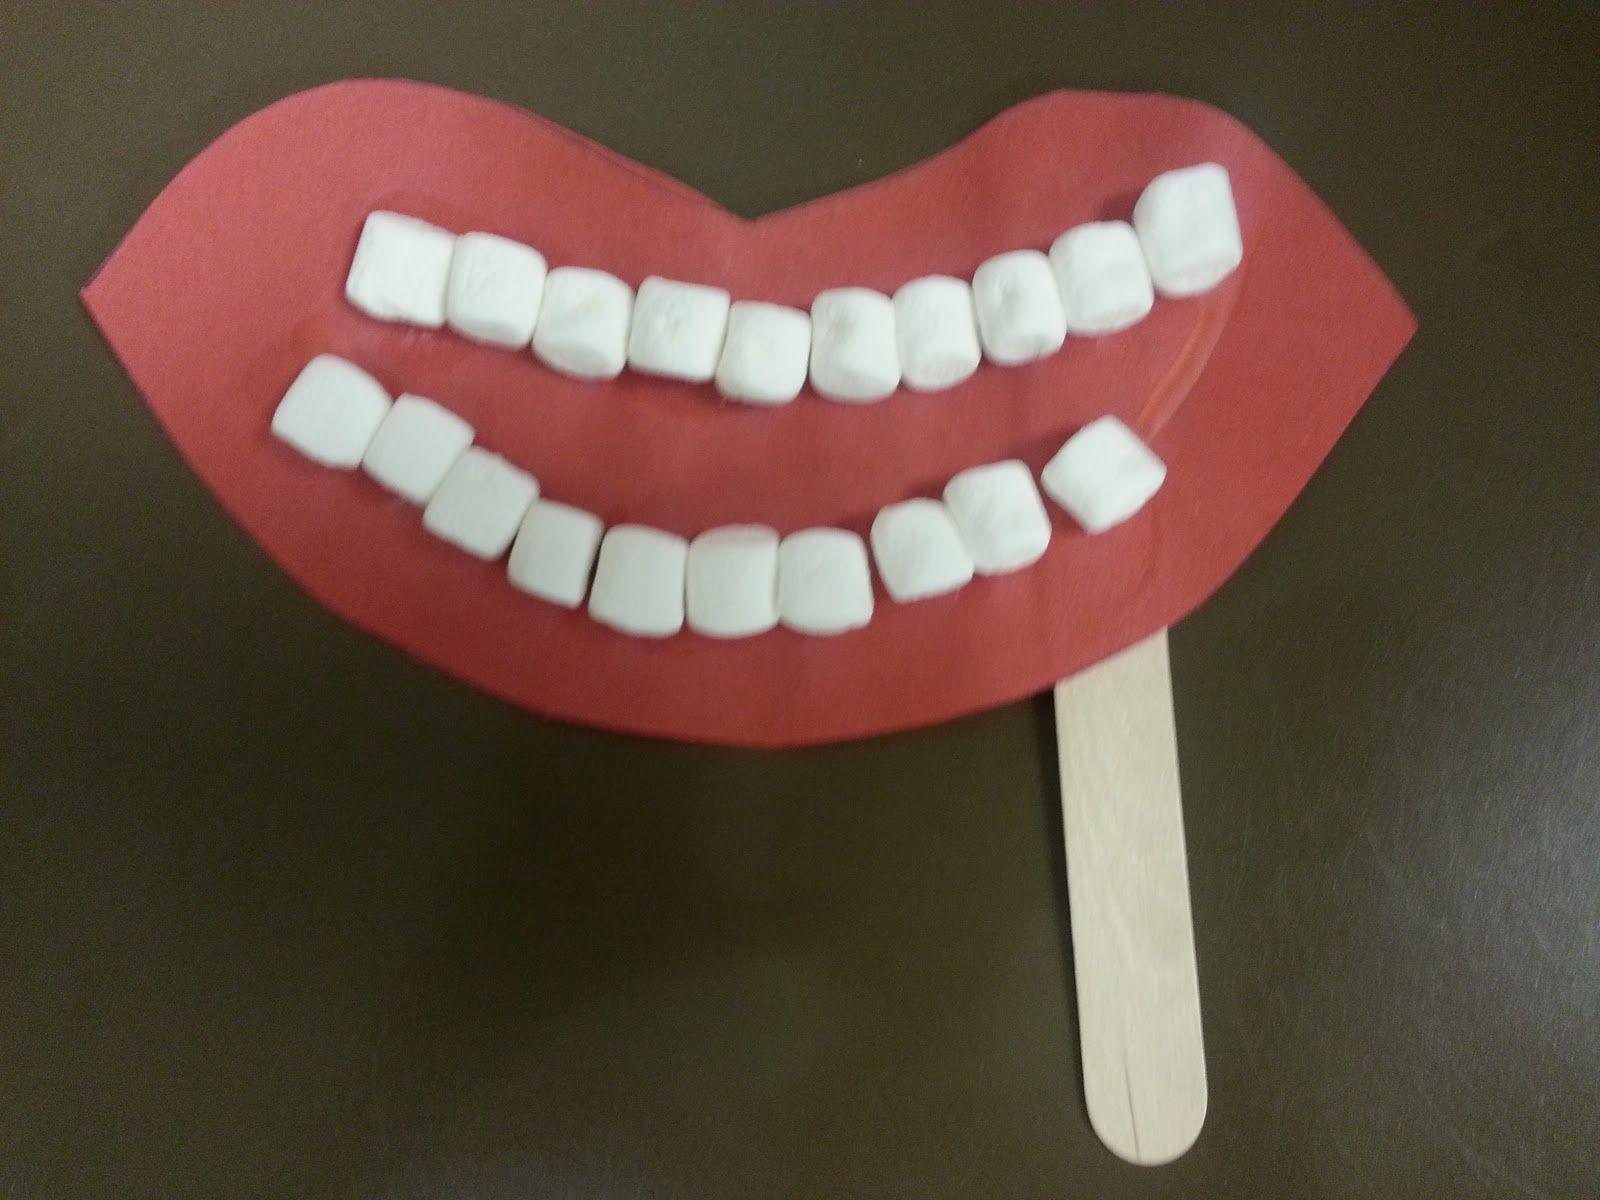 Dental Health And Hygiene